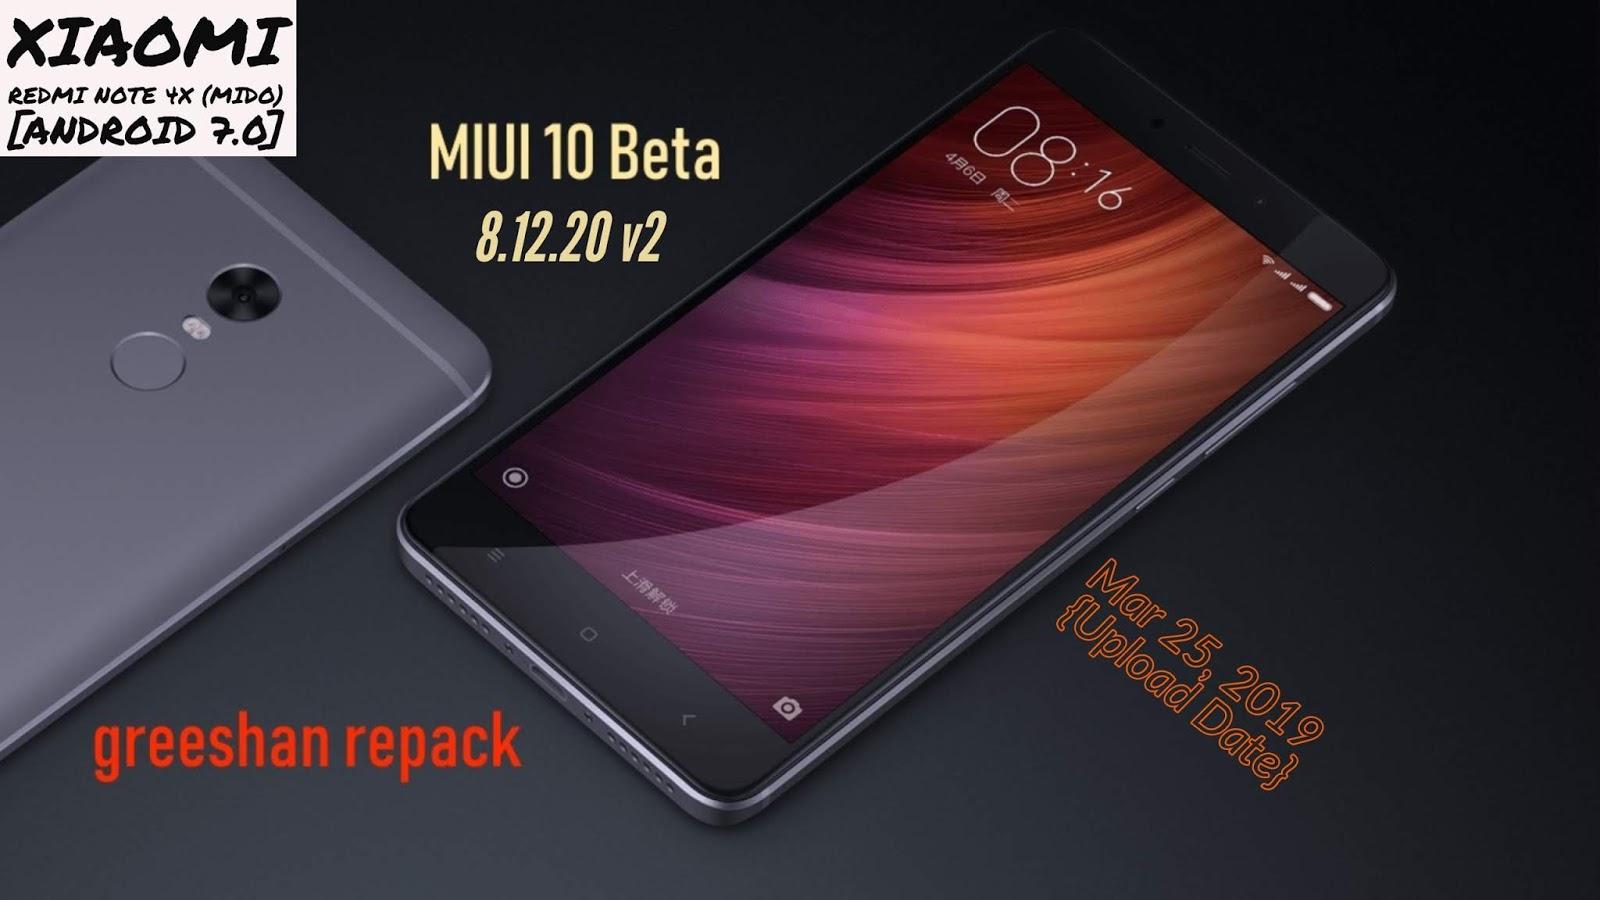 😝 Miui 10 android 8 redmi note 4x | Download MIUI 10 2 8 0